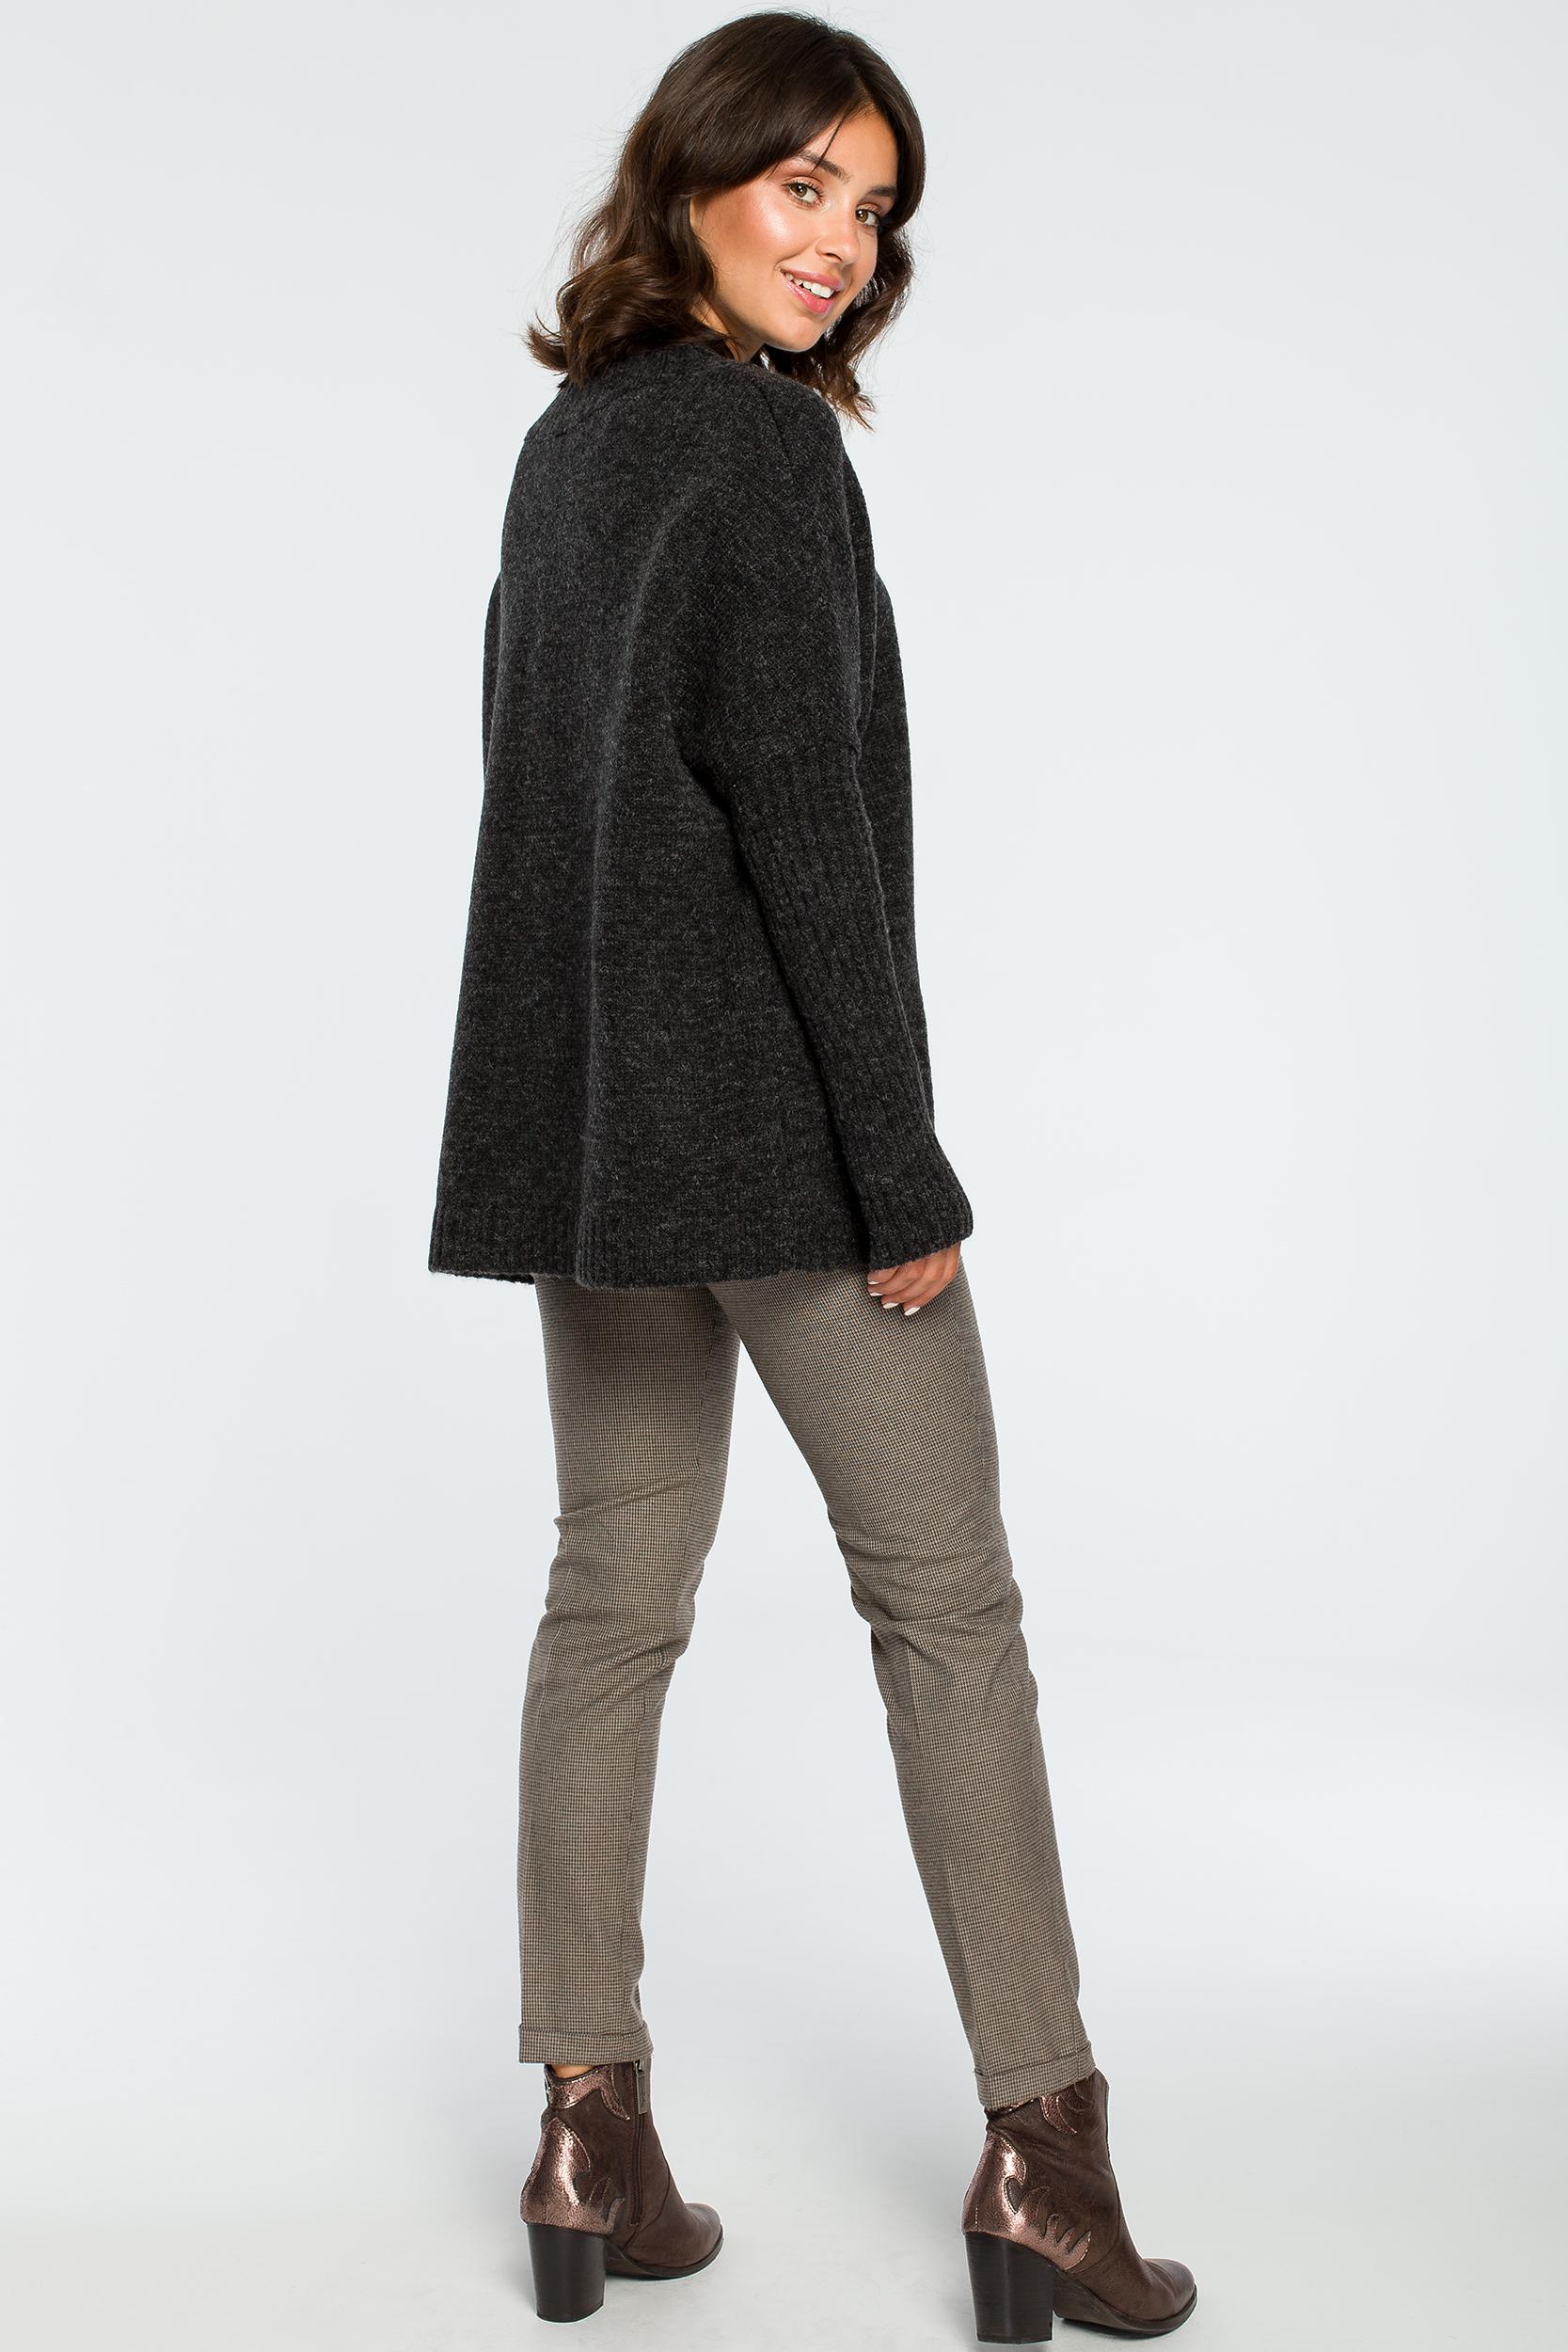 Pullover in Anthrazit Rückansicht komplett